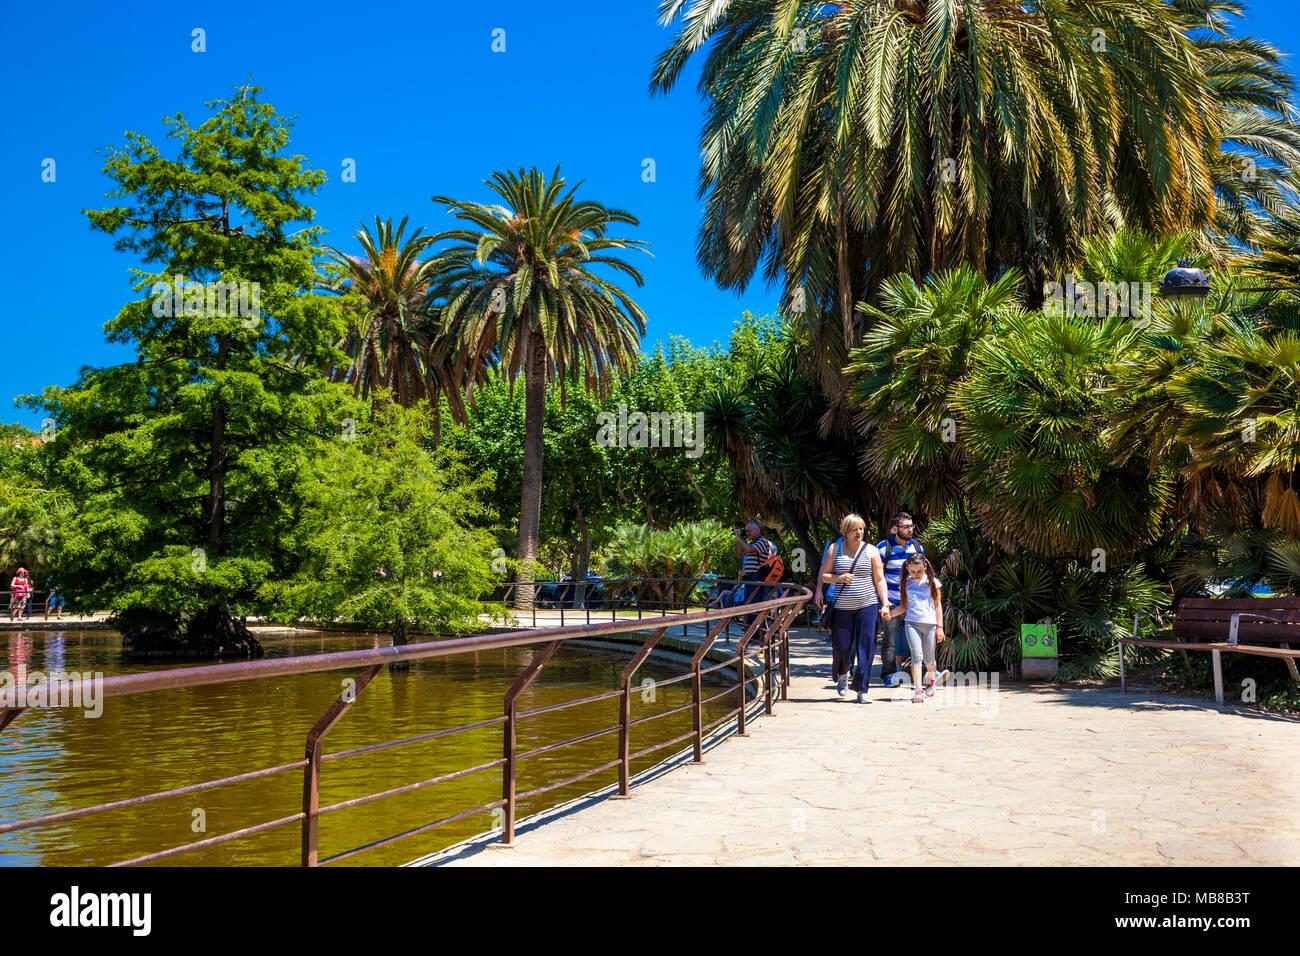 People strolling in Parc de la Ciutadella, Ciutat Vella, Barcelona, Spain - Stock Image